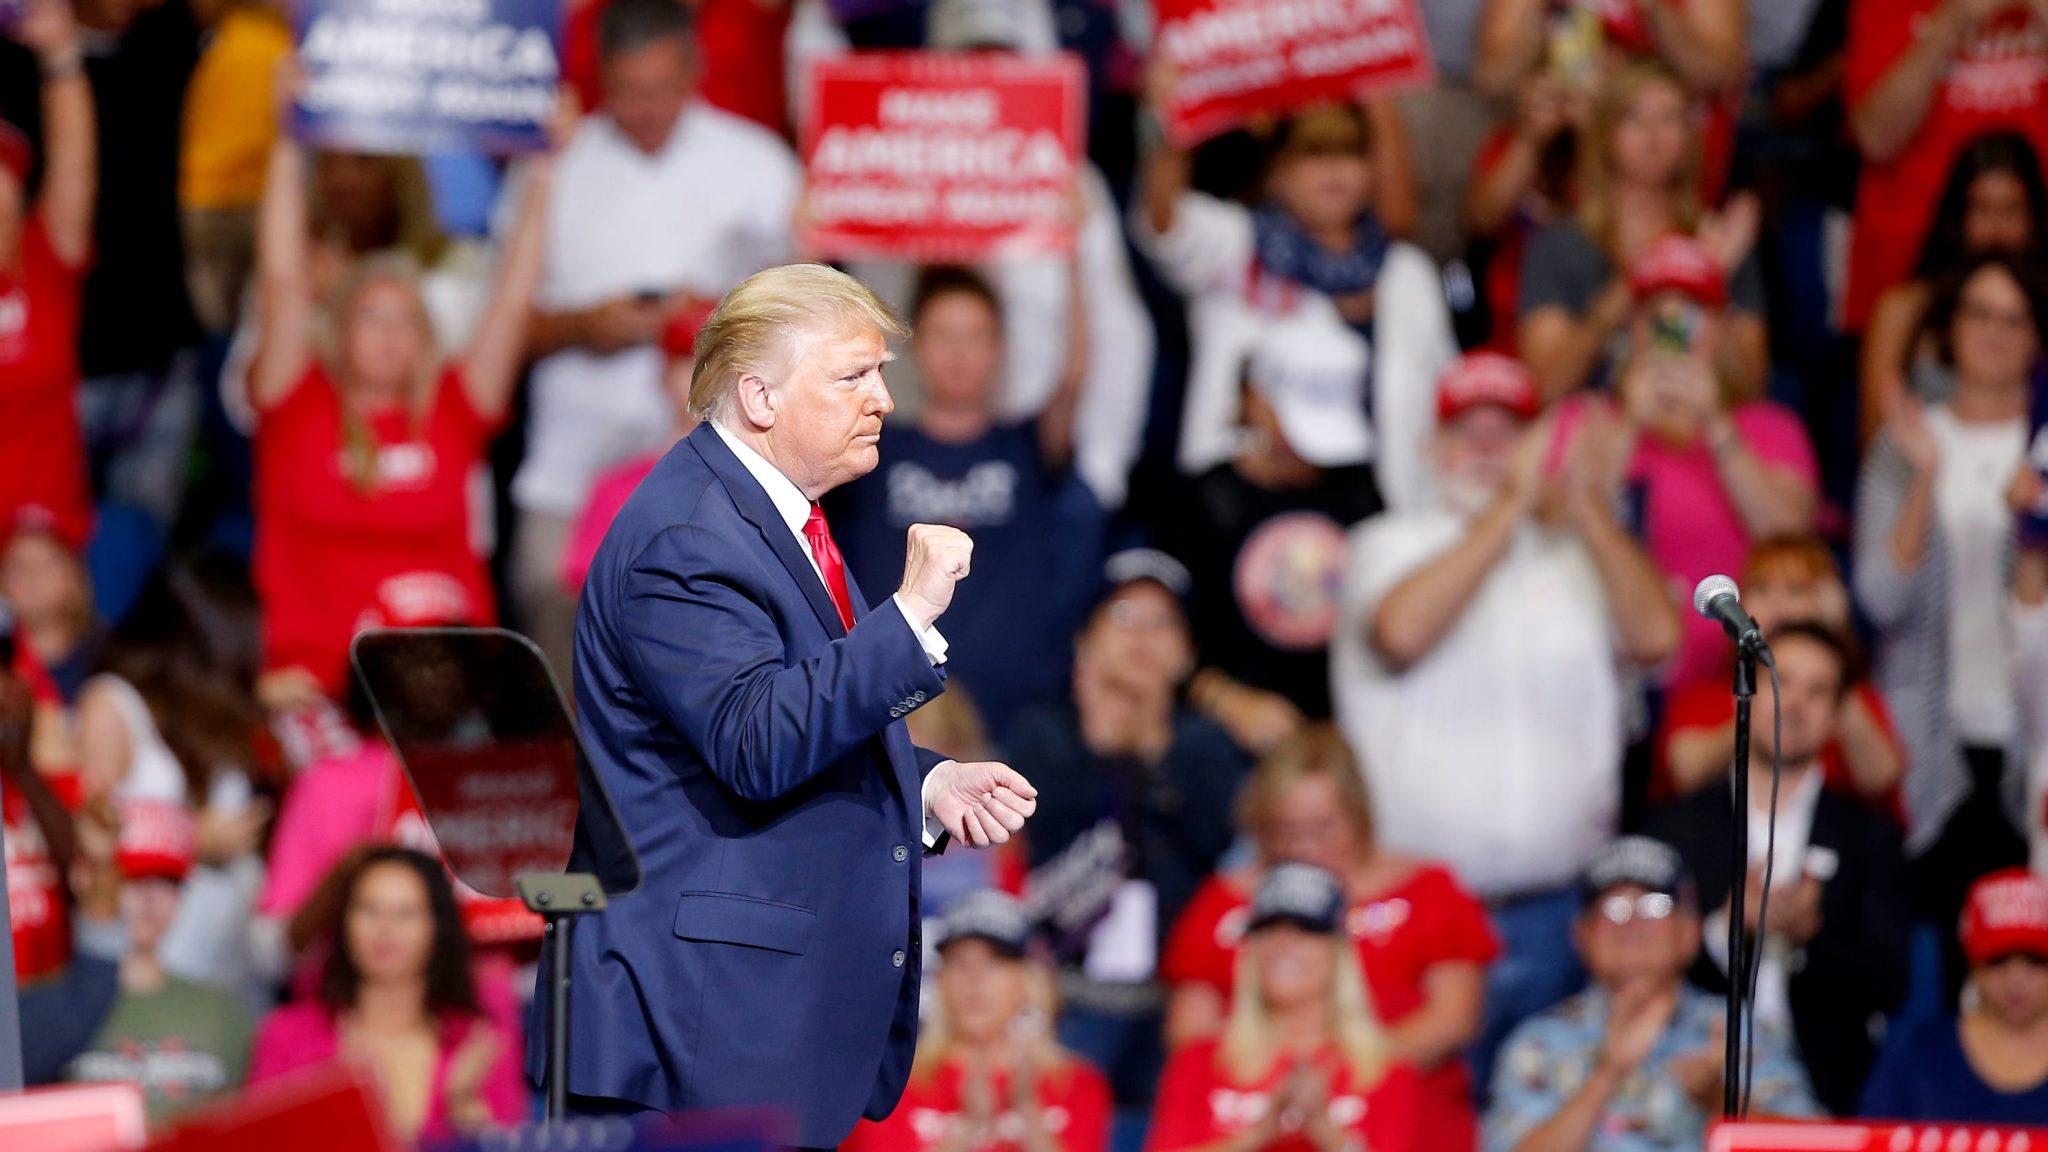 Trump Kung Flu Rally